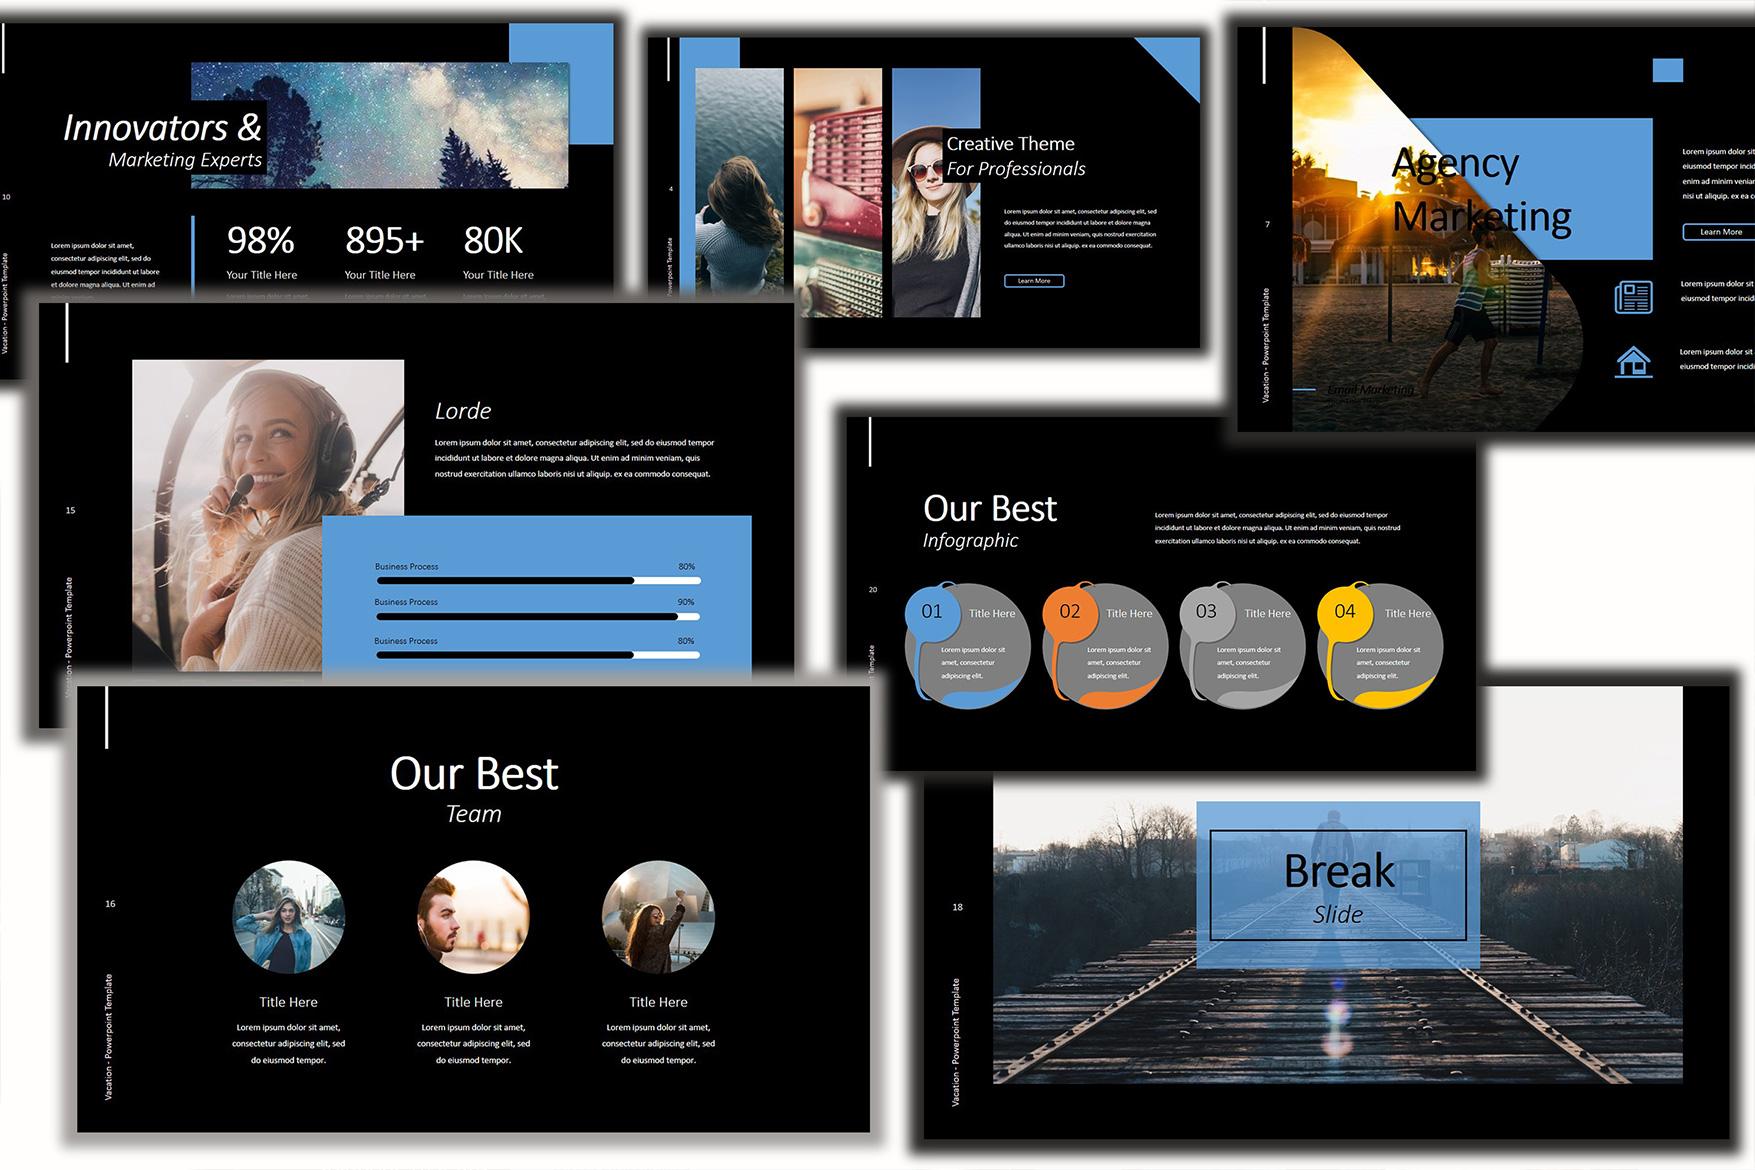 Vacation Lookbook Dark Google Slides Presentation example image 2